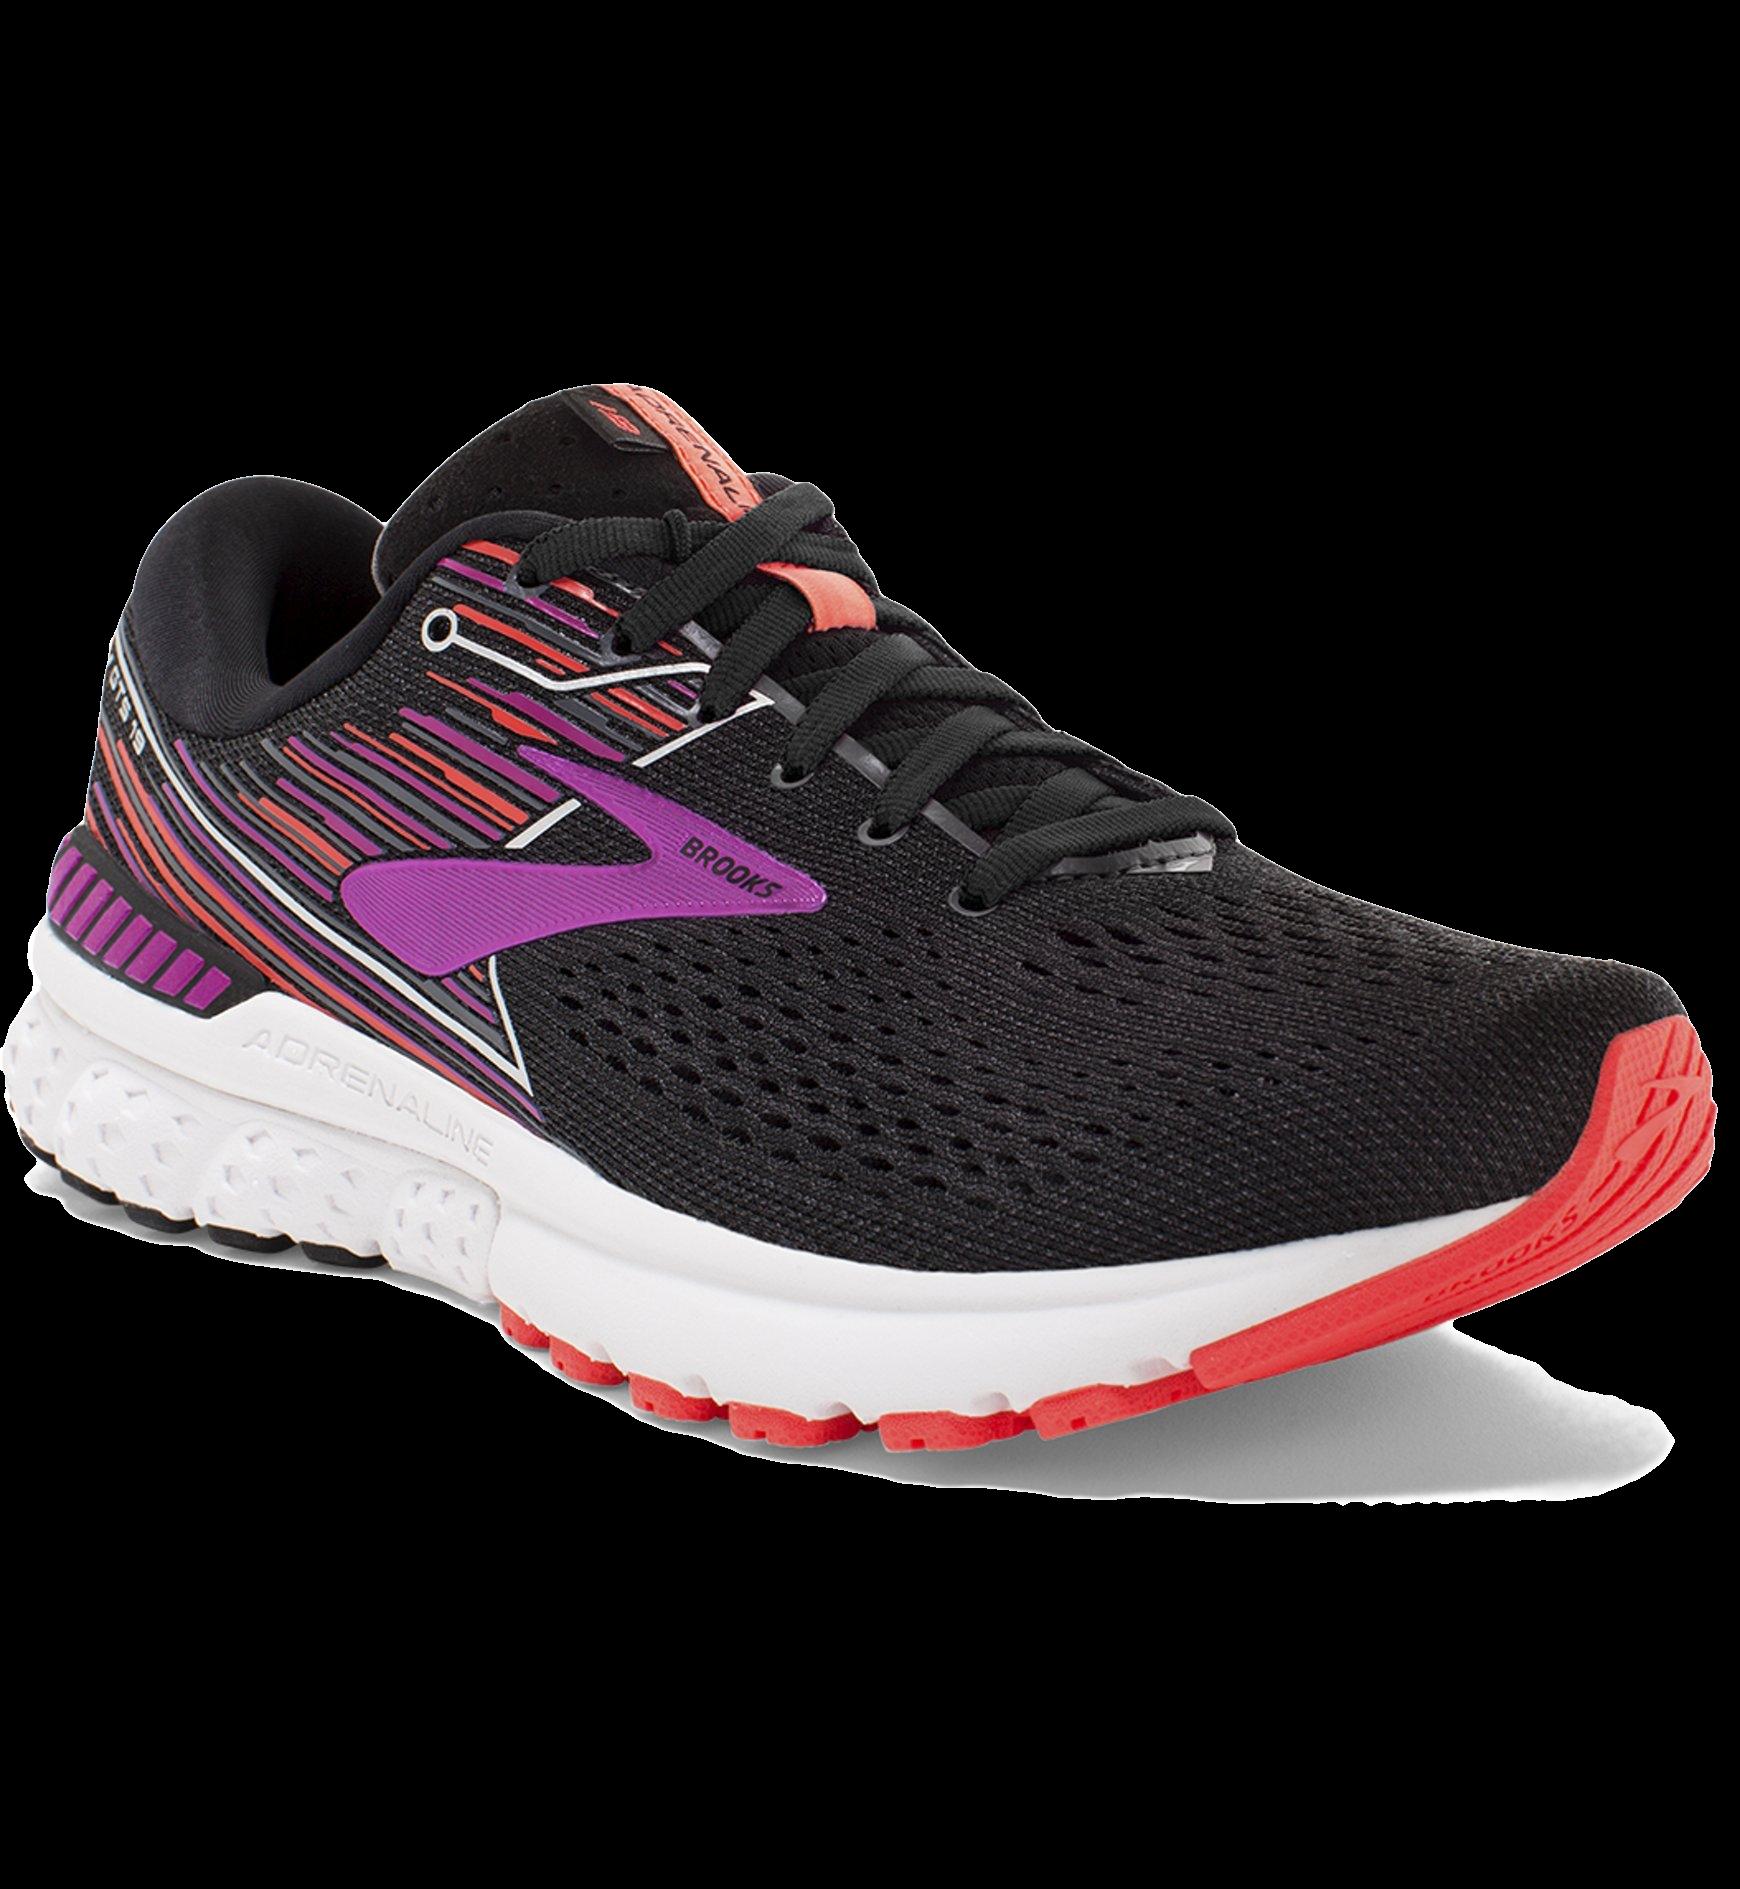 Adrenaline GTS 19 W Brooks – Stabilitäts-Laufschuh – Damenmodell